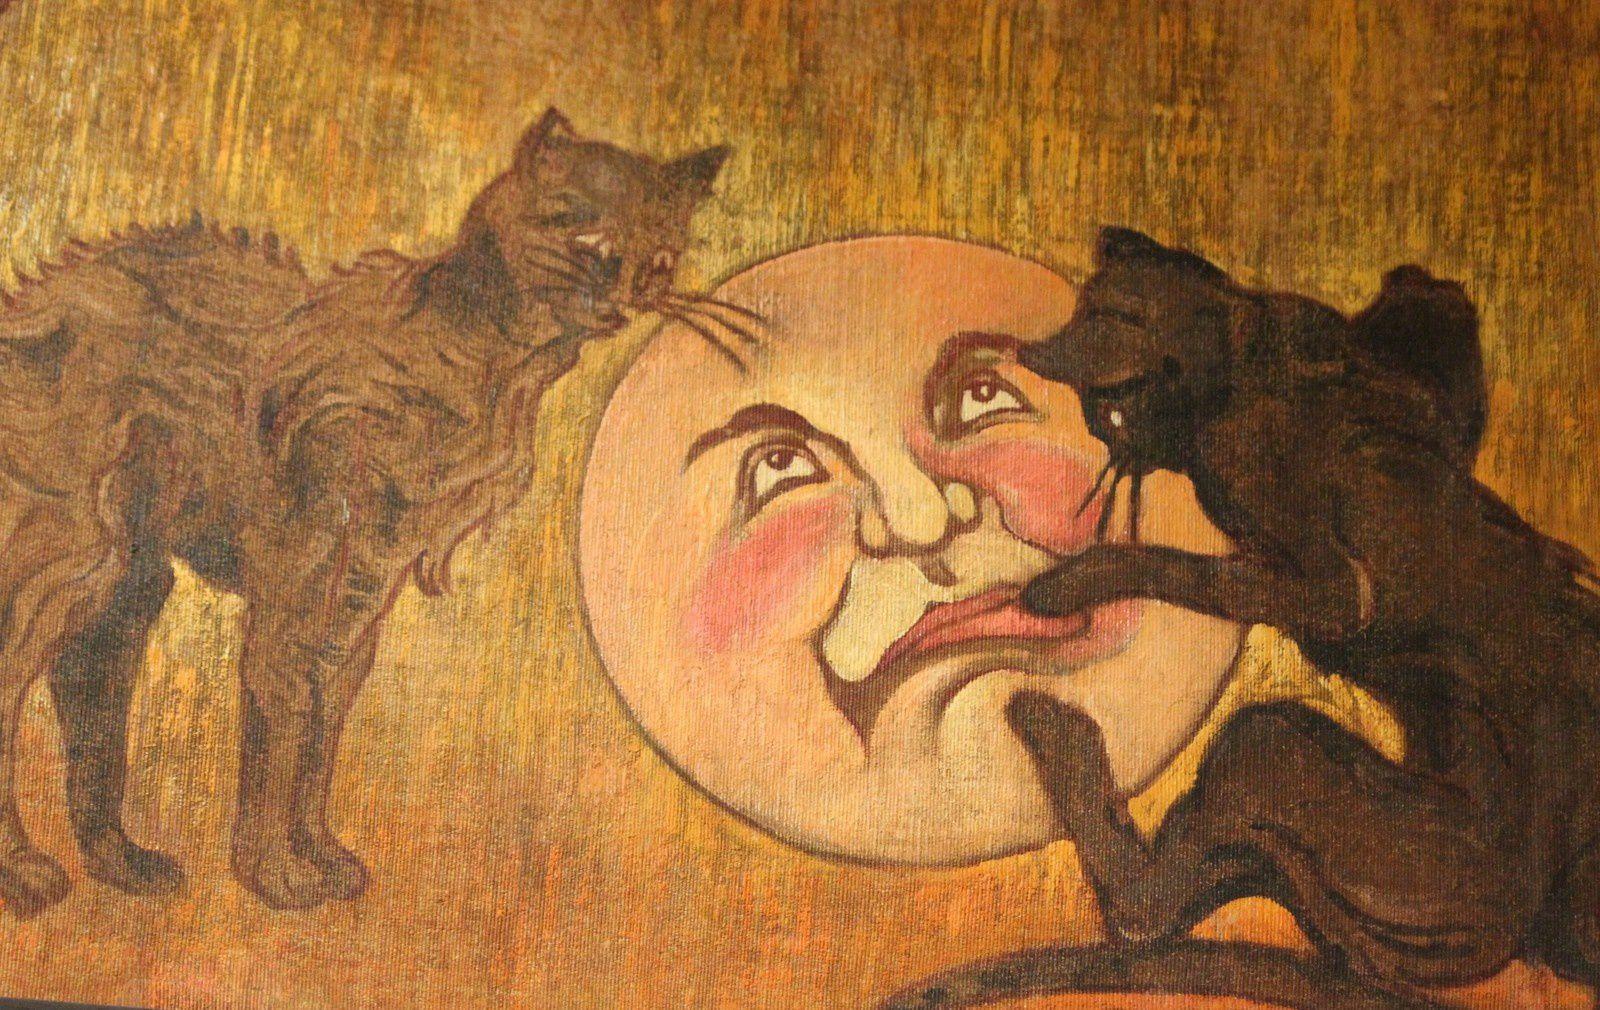 Steinlen. Musée de Montmartre. Chats et lunes.